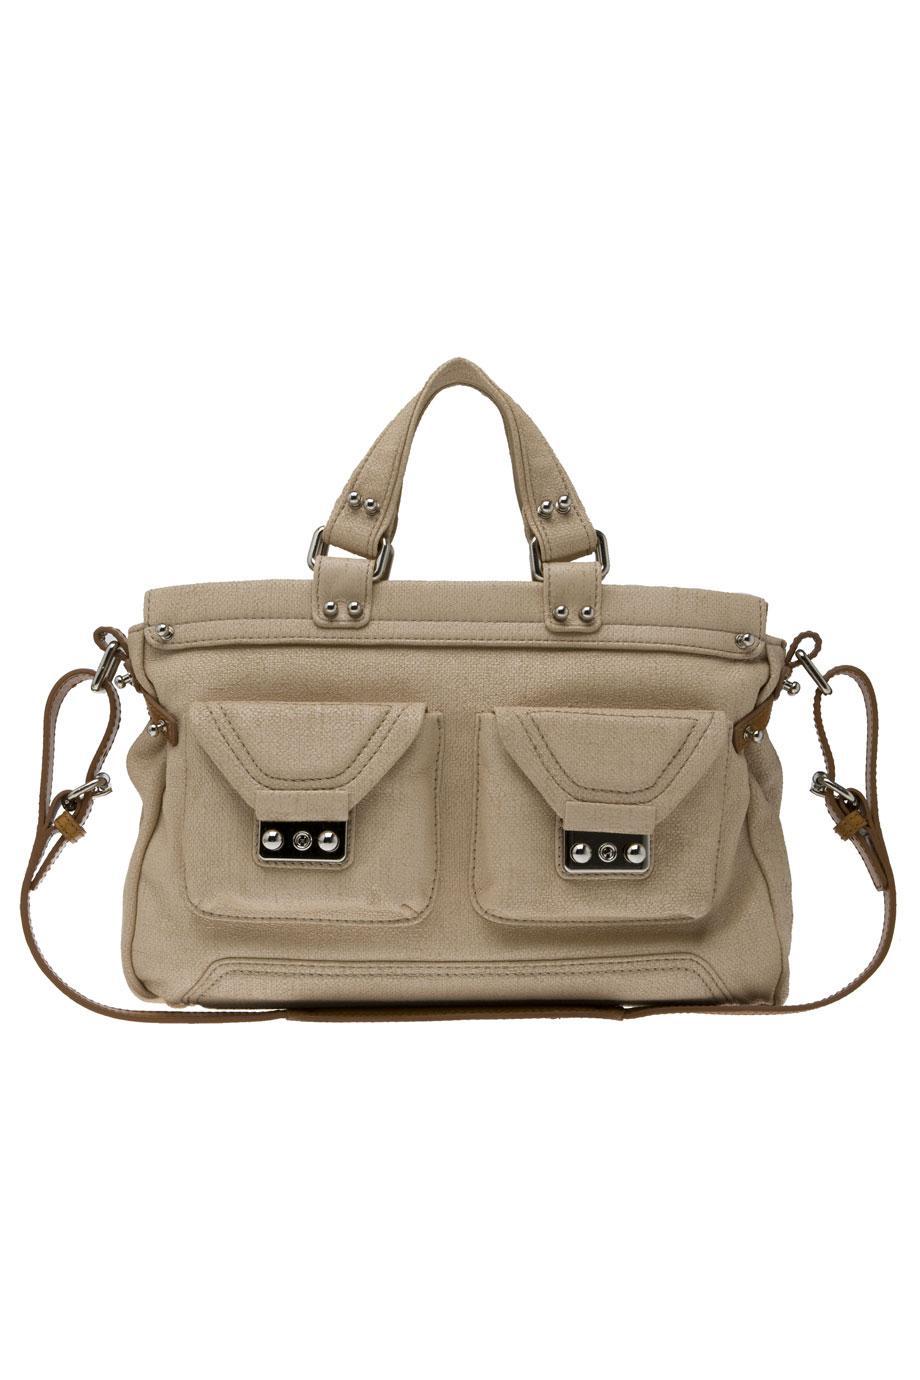 Man Hand Bag (HB_BN_010) | Fatima International Ltd.